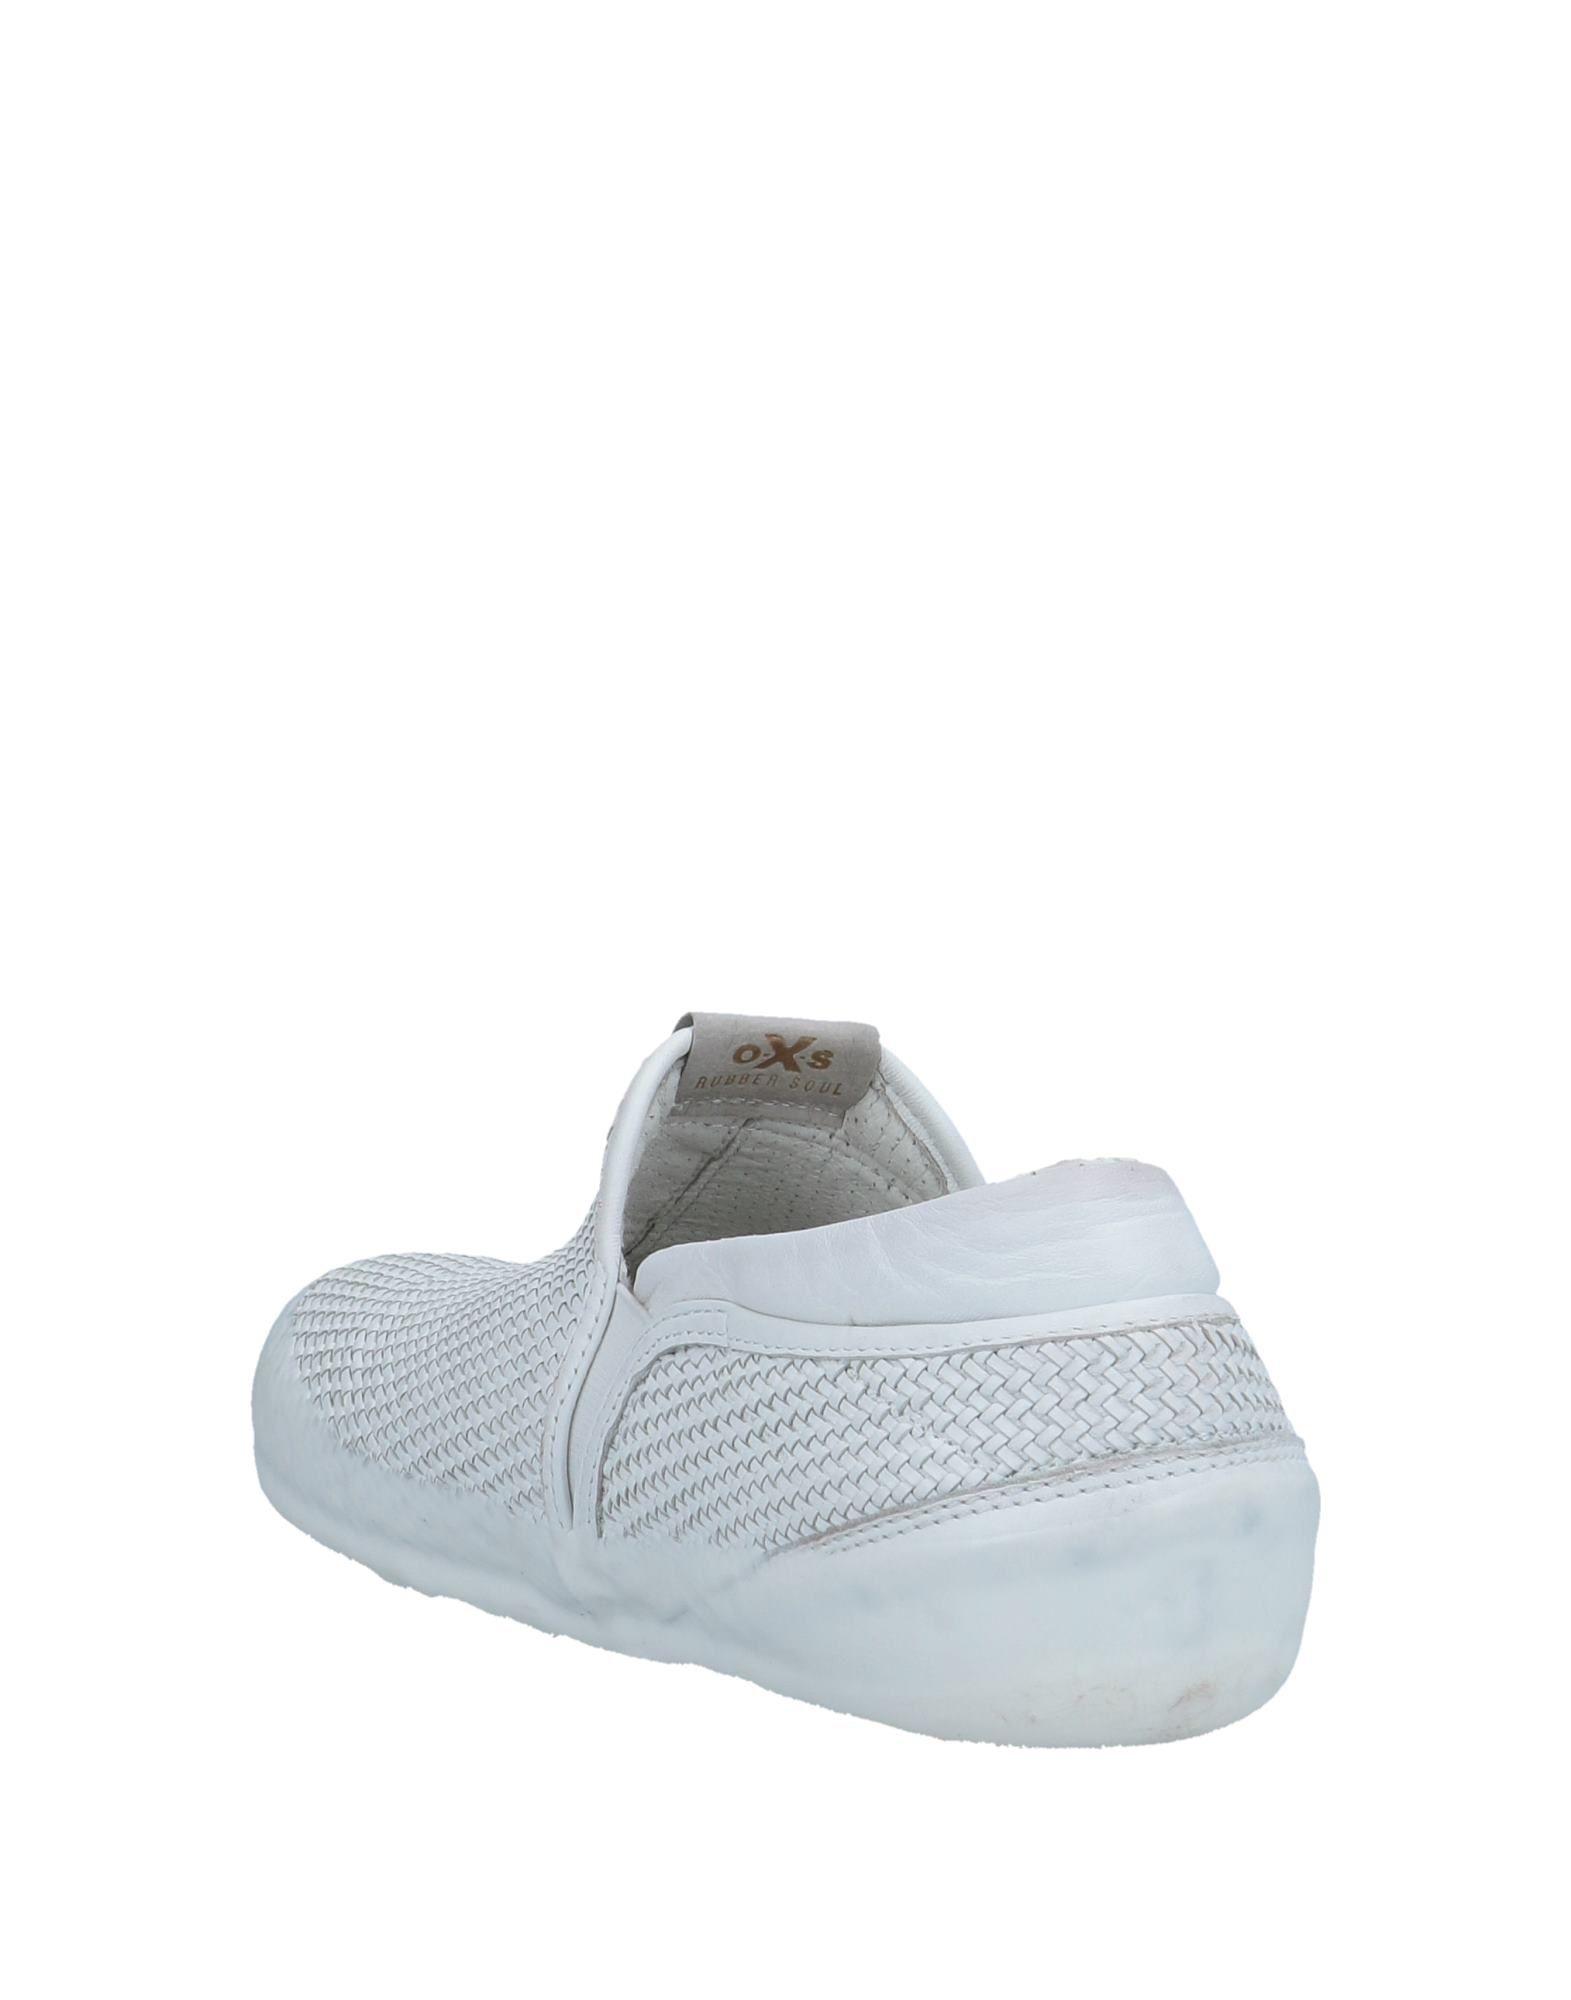 Rabatt Schuhe Damen O.X.S. Rubber Soul Sneakers Damen Schuhe  11552917WR d3c750